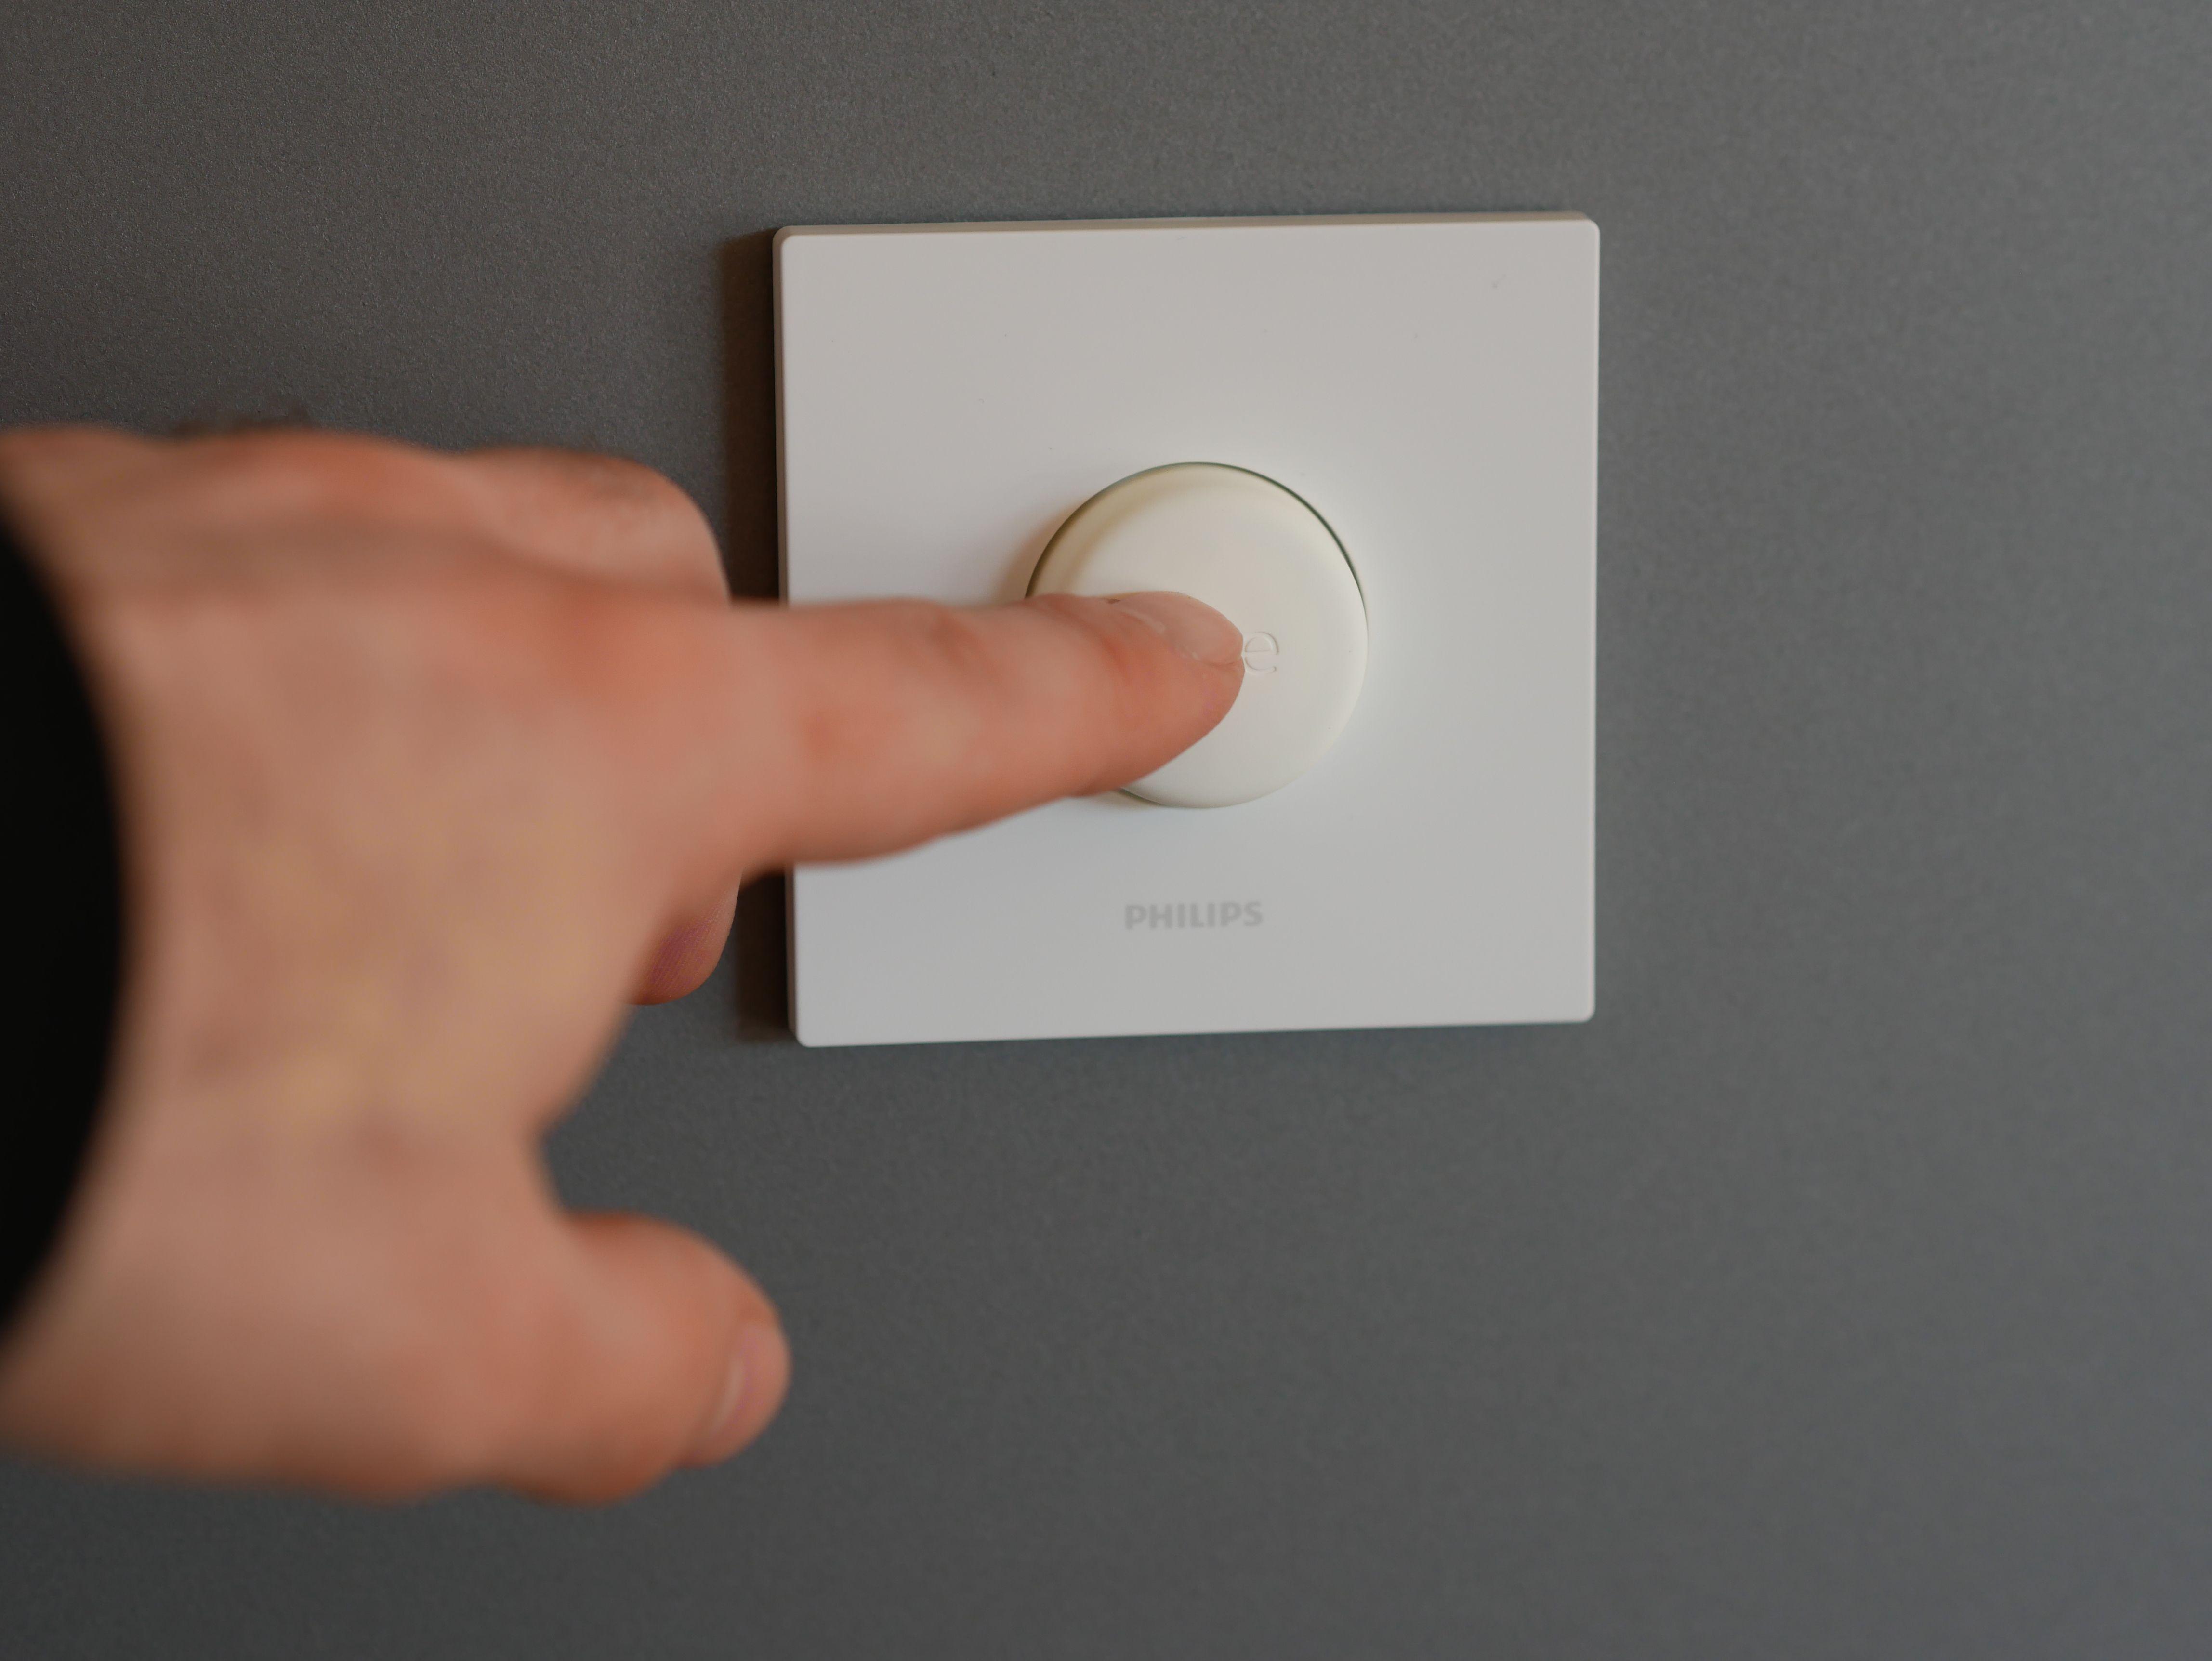 Philips Hue Smart Button Im Test Kompakter Lichtschalter Fur Das Hue System Housecontrollers In 2020 Lichtschalter Lichtsteuerung Hue